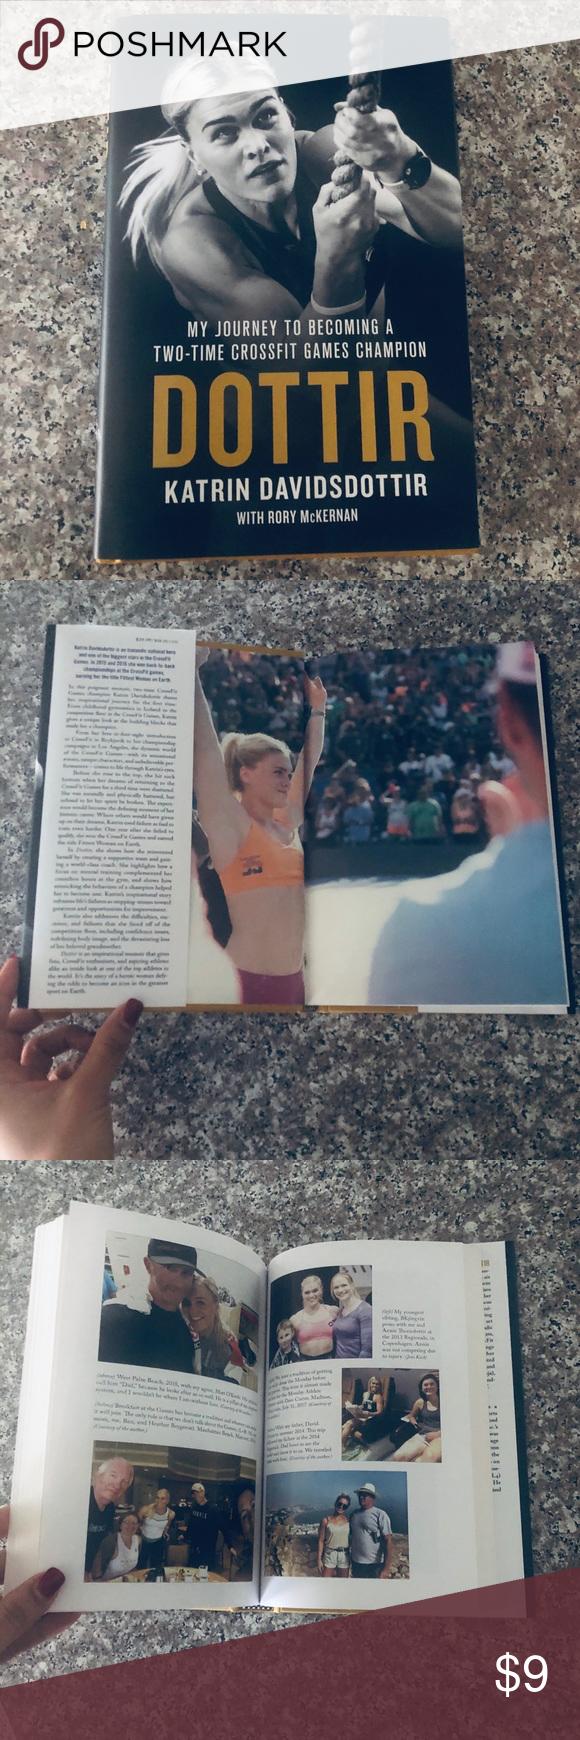 Katrin Davidsdottir CrossFit Games champion book in 2020